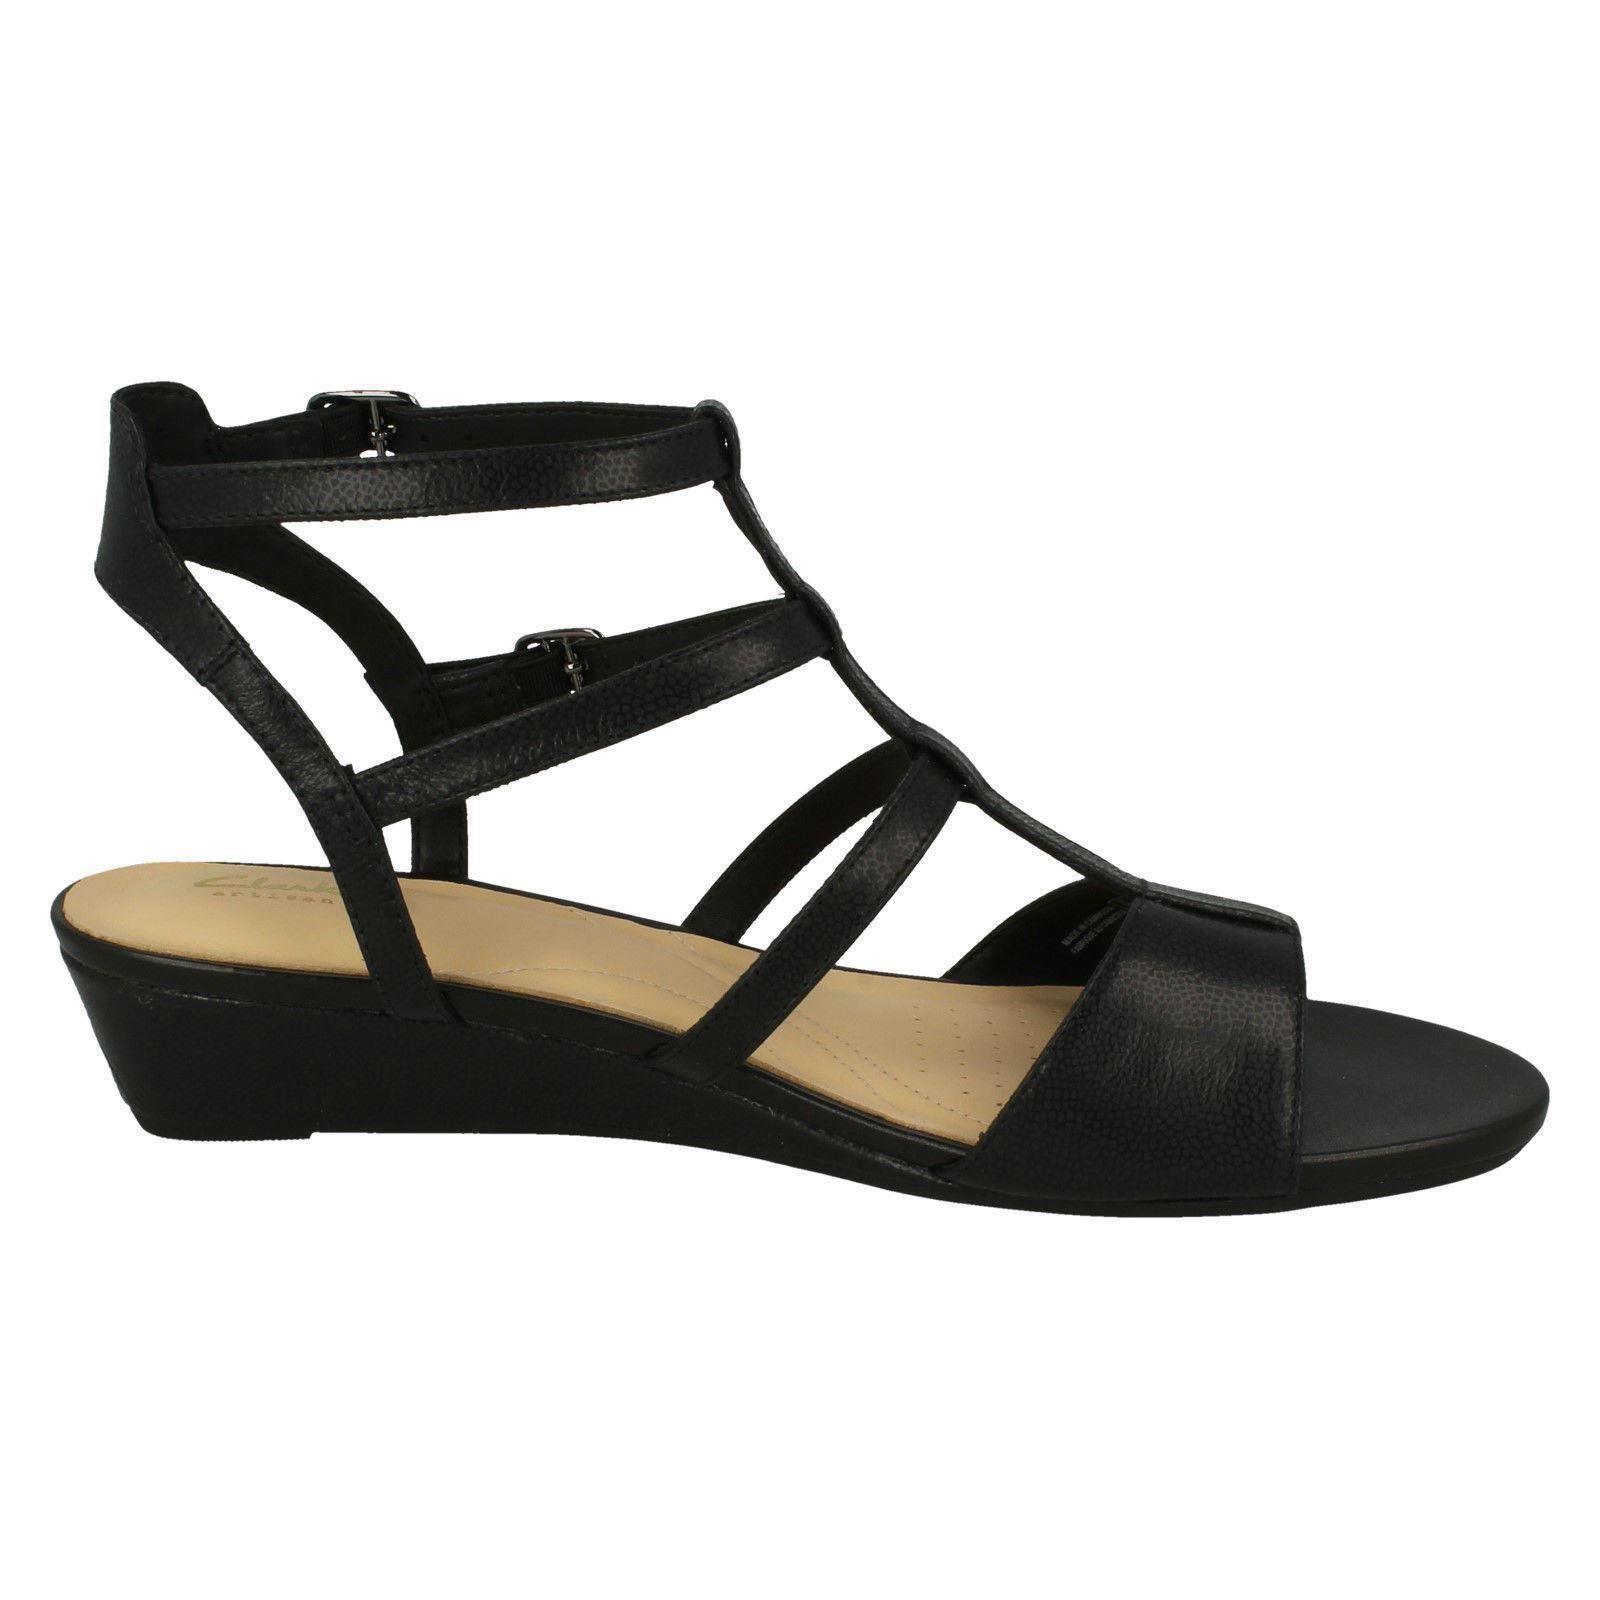 541bb1dfc Ladies-Clarks-Parram-Spice-Gladiator-Sandals thumbnail 7